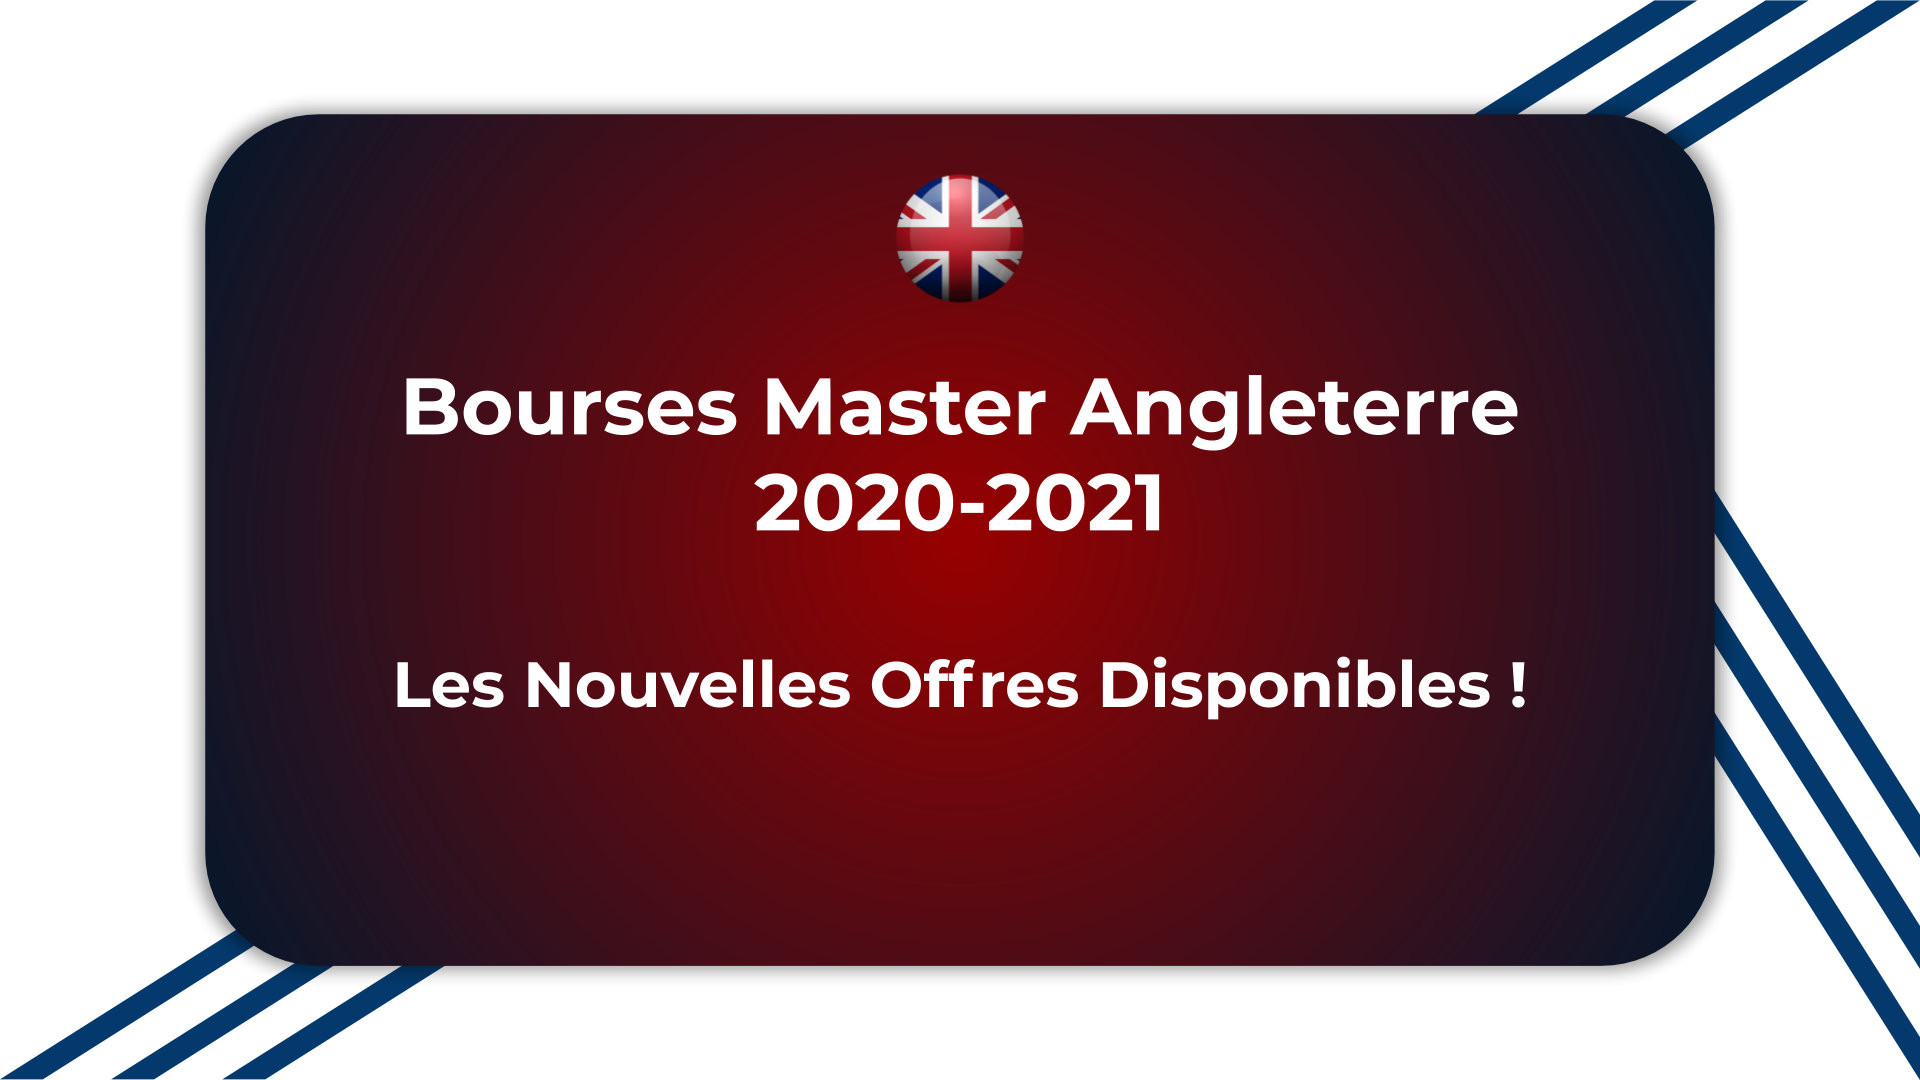 Bourses Master Angleterre 2020-2021